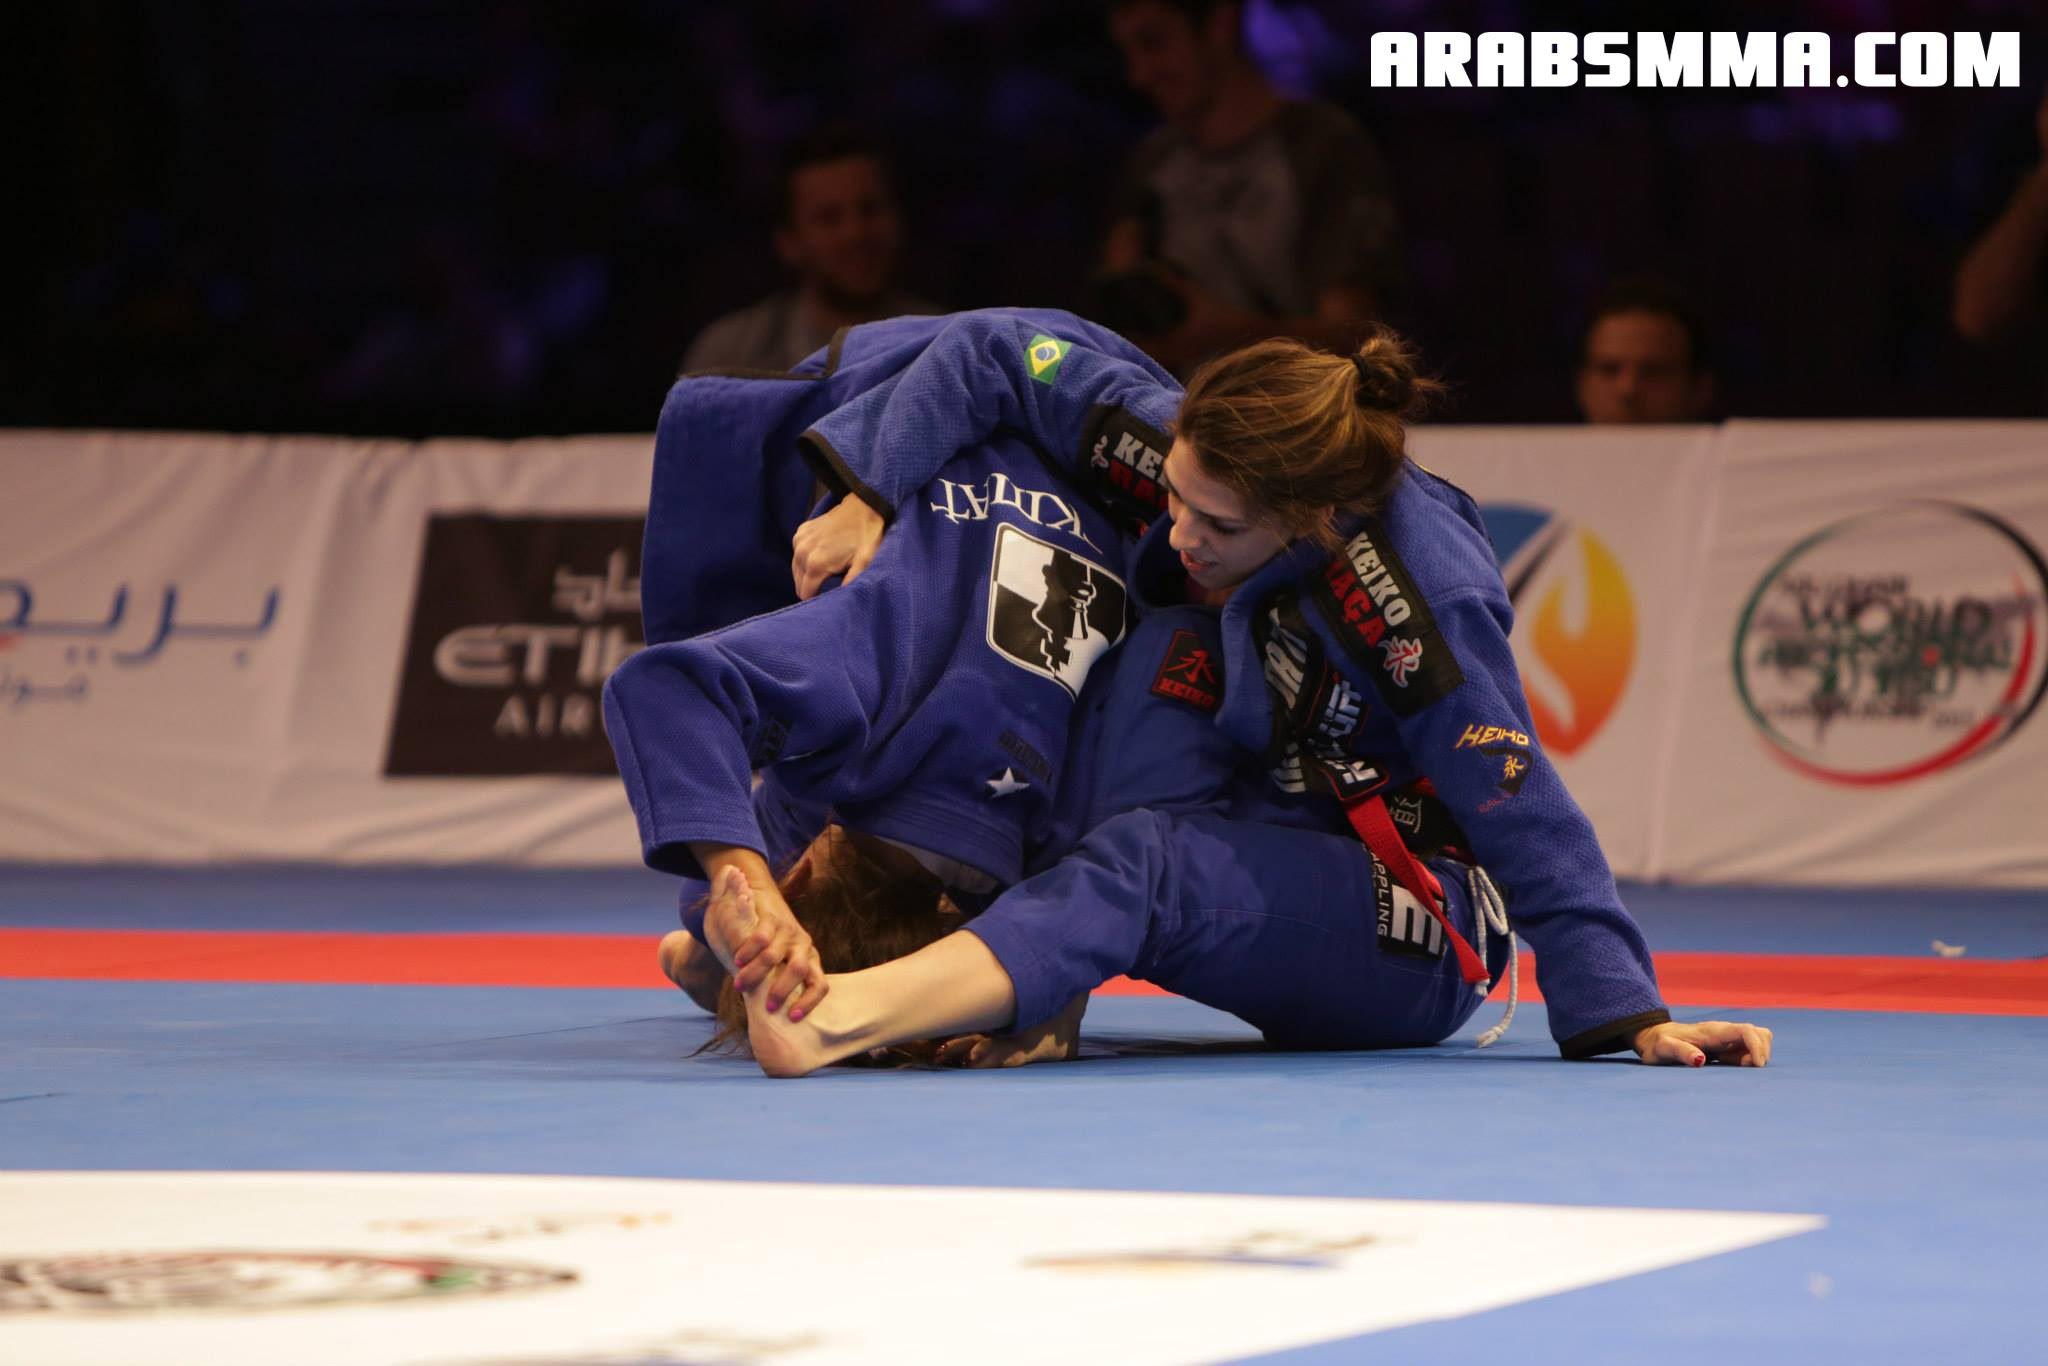 Abu Dhabi World Professional Jiu-Jitsu Championship 2015